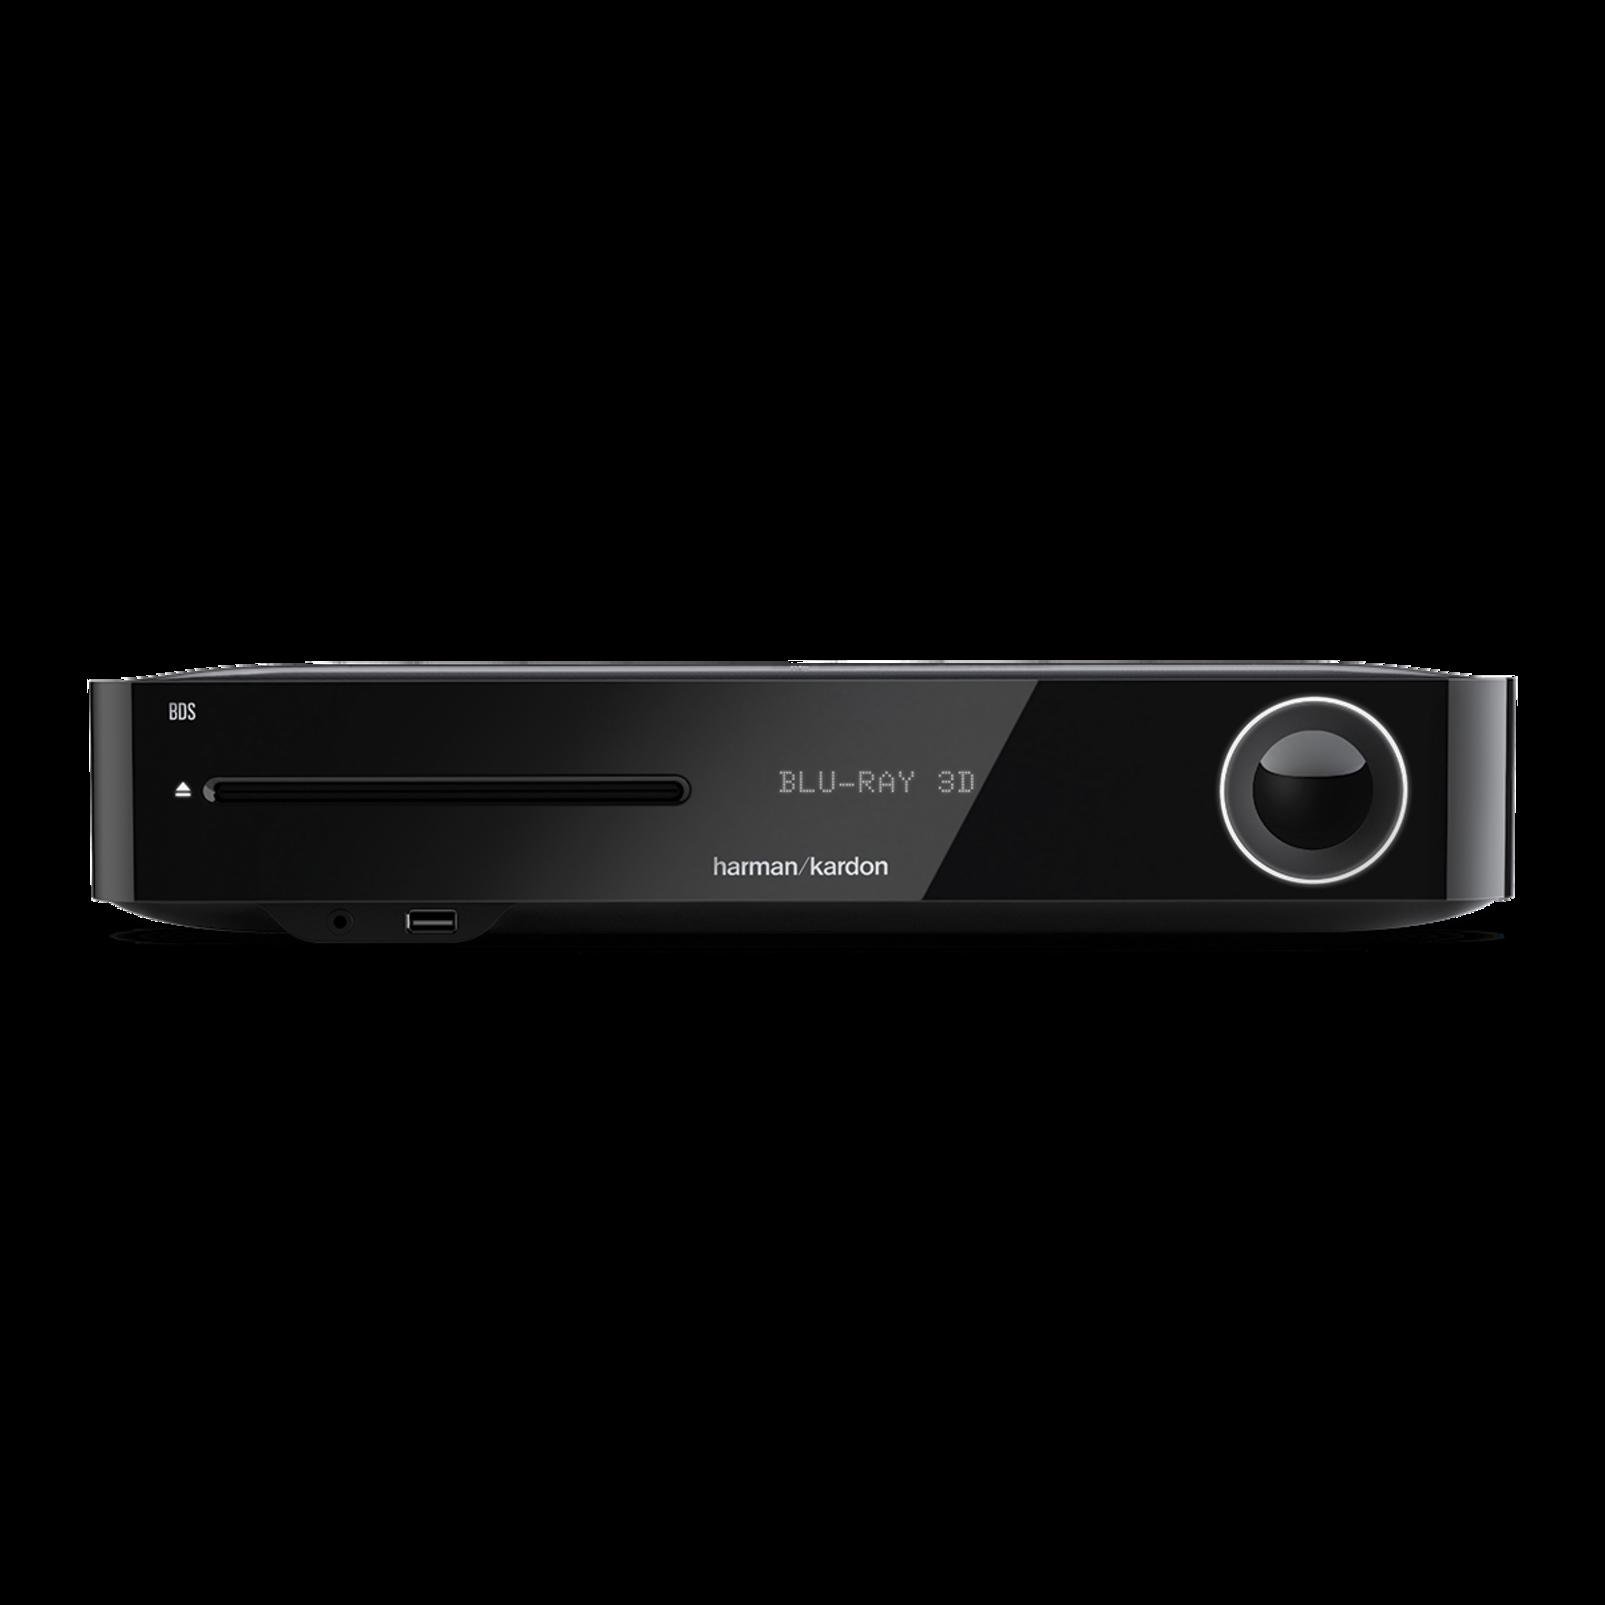 Harman Kardon BDS 280, Blu-ray Disc System + FREE HKTS 2 MKII Home Theater System $250 + Free Shipping!